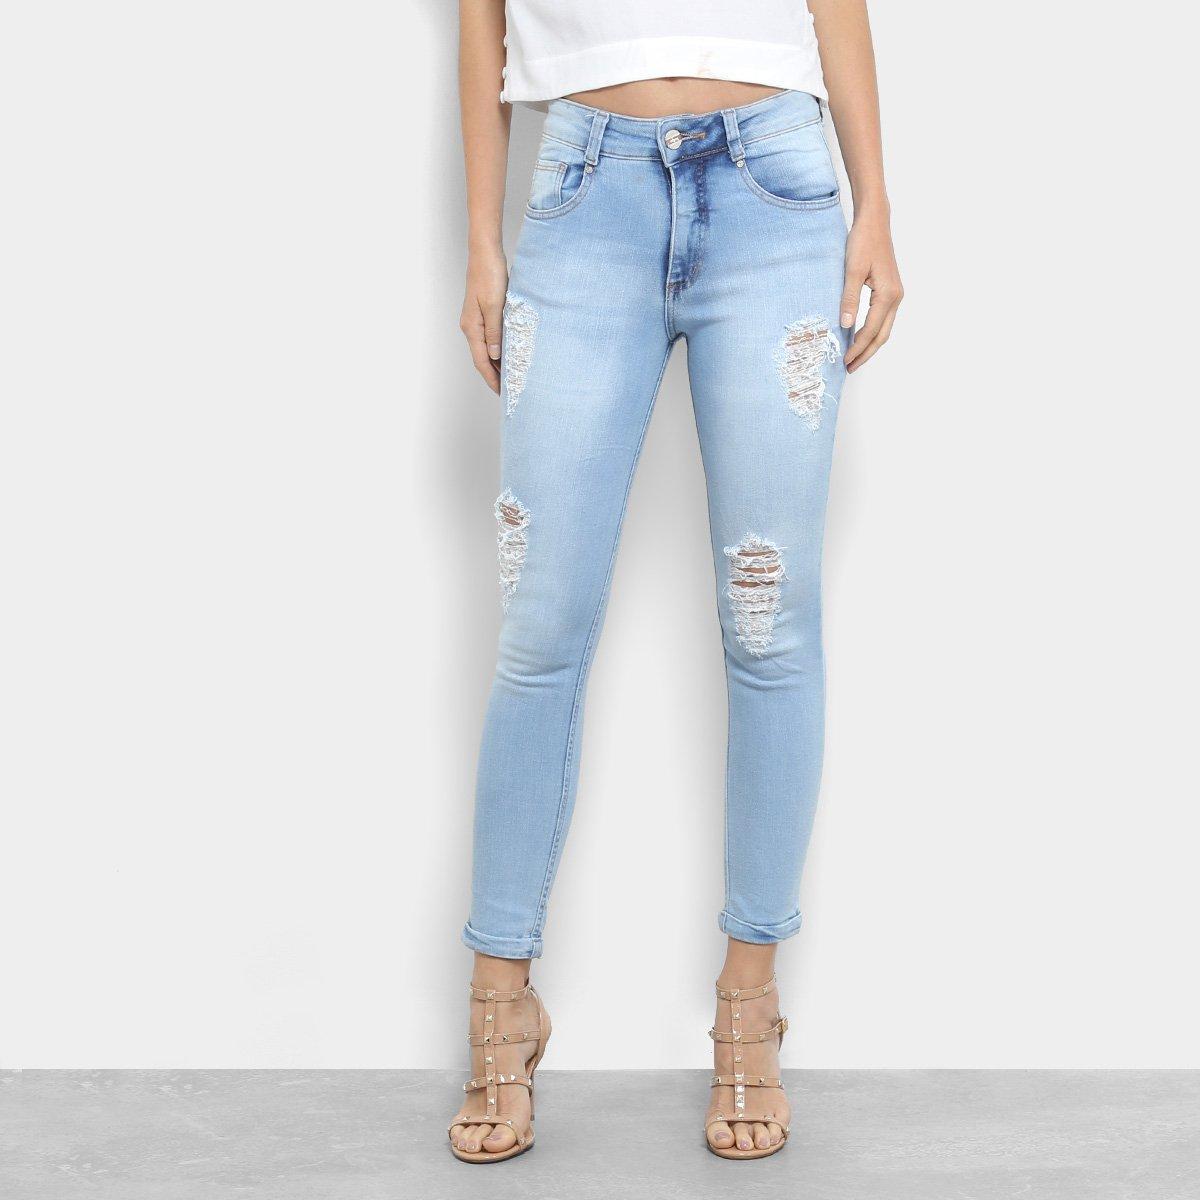 Calça Jeans Skinny Biotipo Cintura Média Feminina cfa2111451f